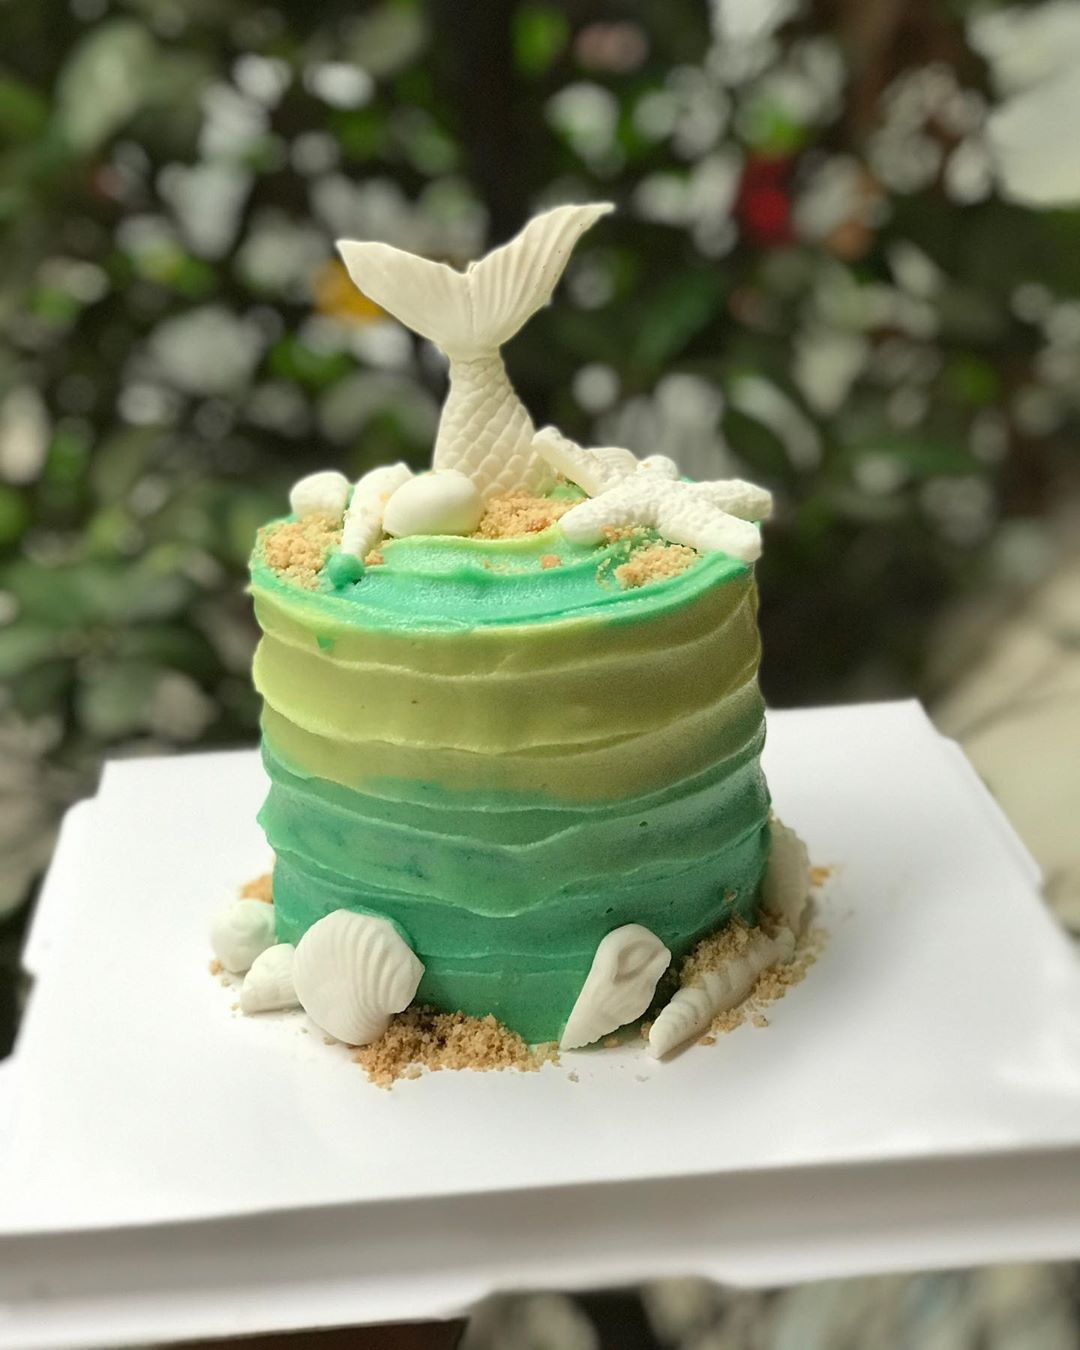 I Love Baby Cakes